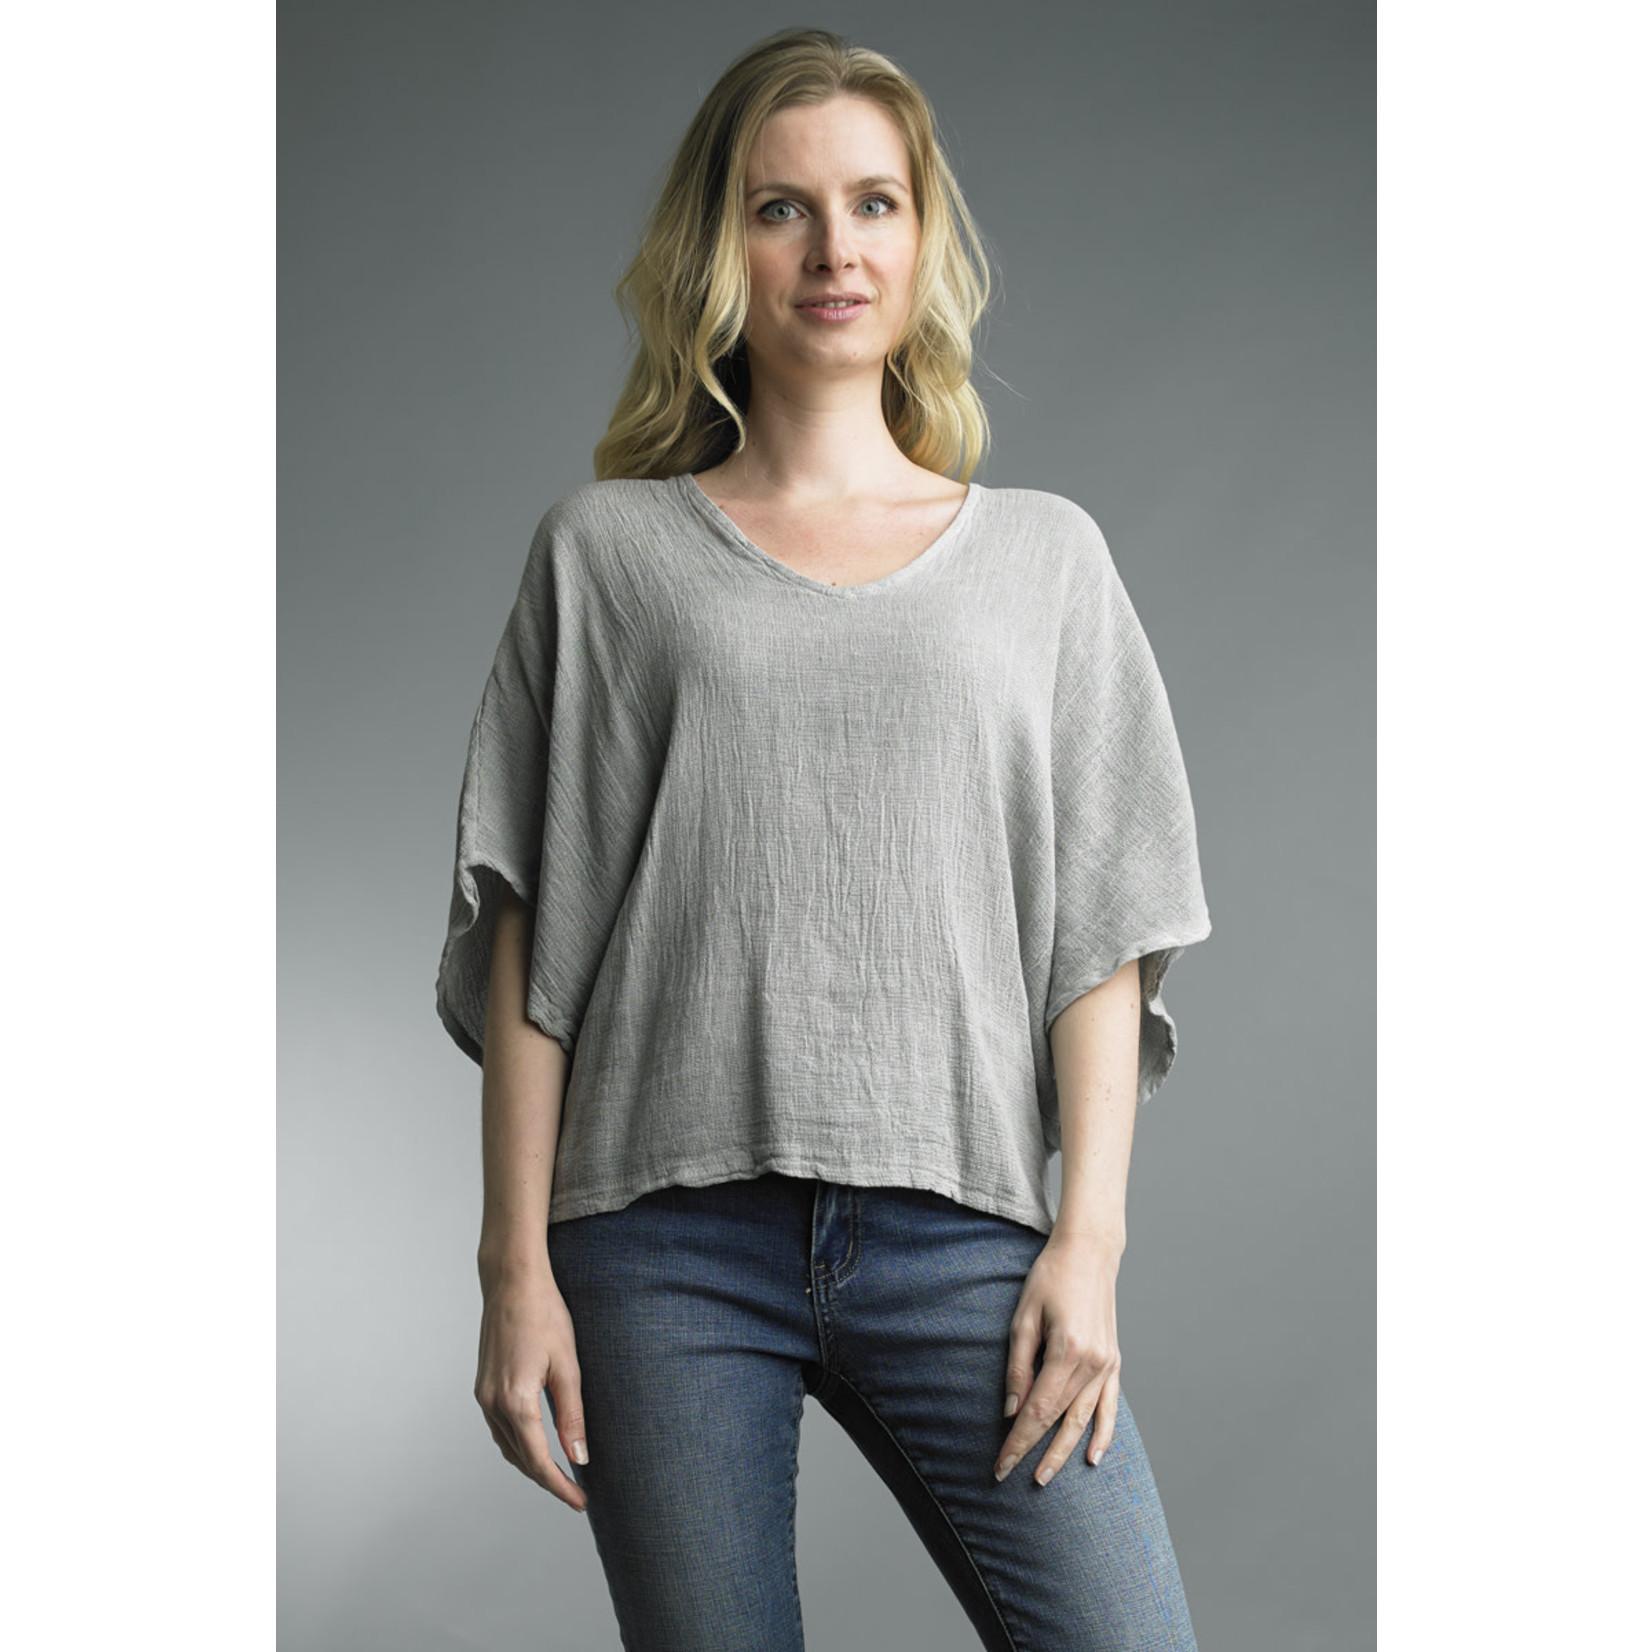 Tempo Paris Gray Linen Oversized V-neck Tee w/ Dolman Sleeves